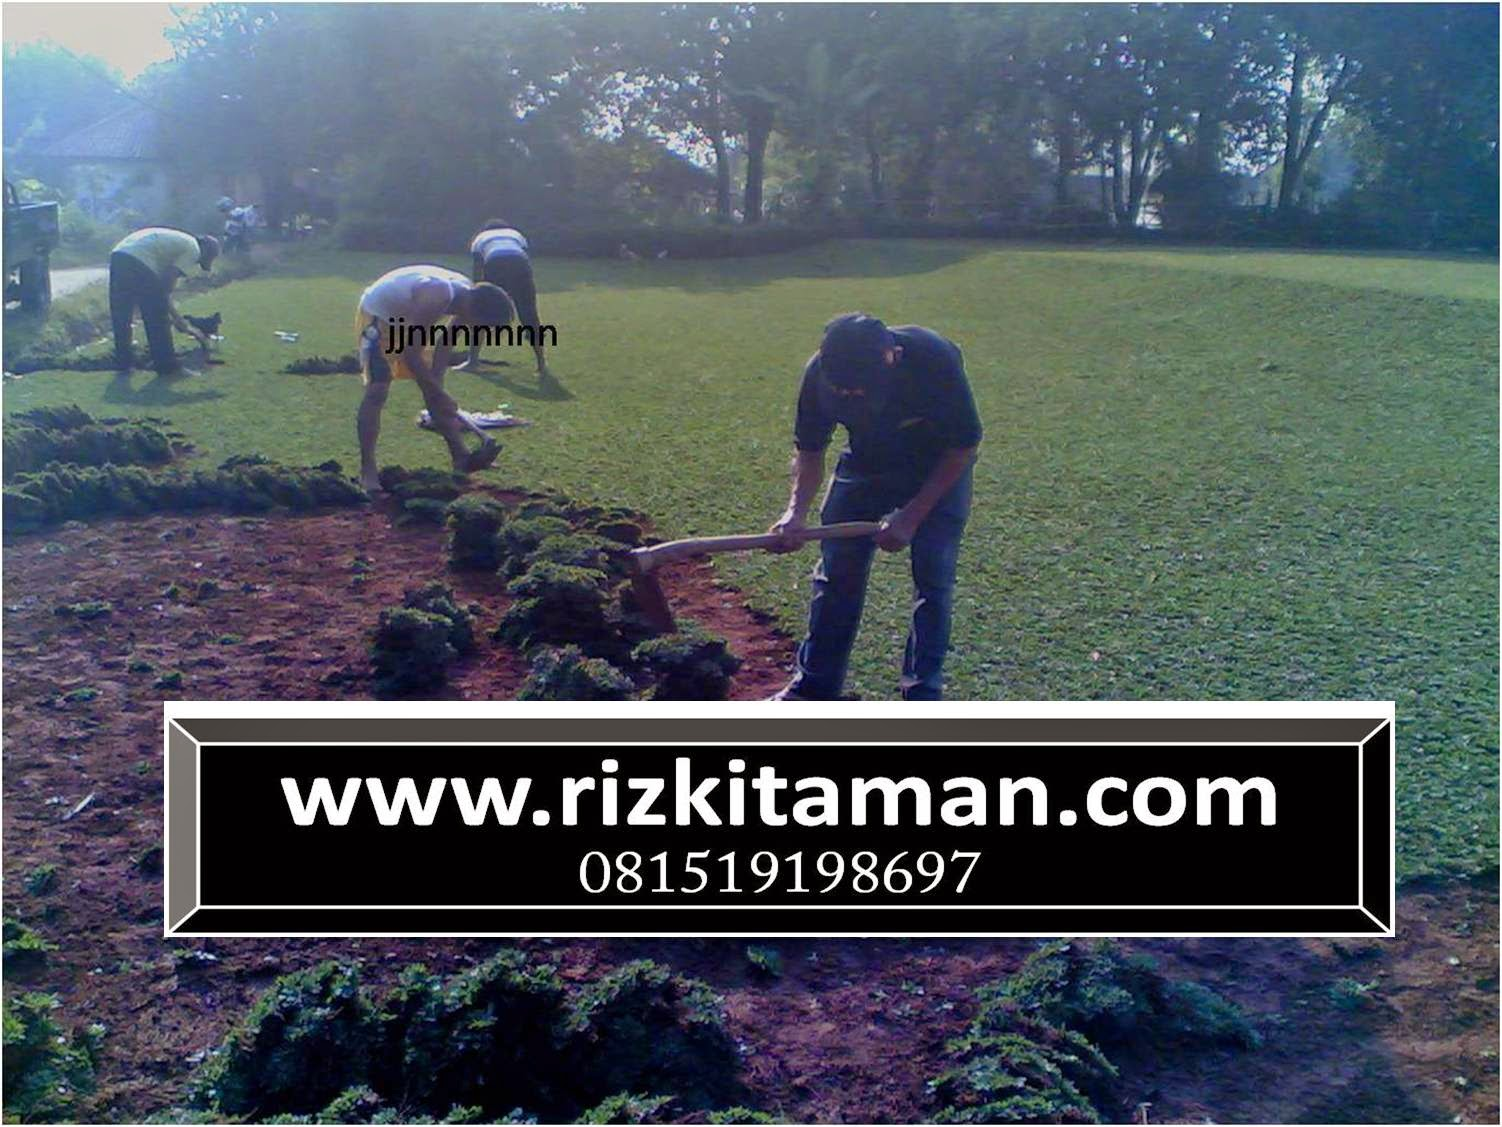 Tukang rumput gajahmini | suplier rumput taman dan jasa penanaman rumput